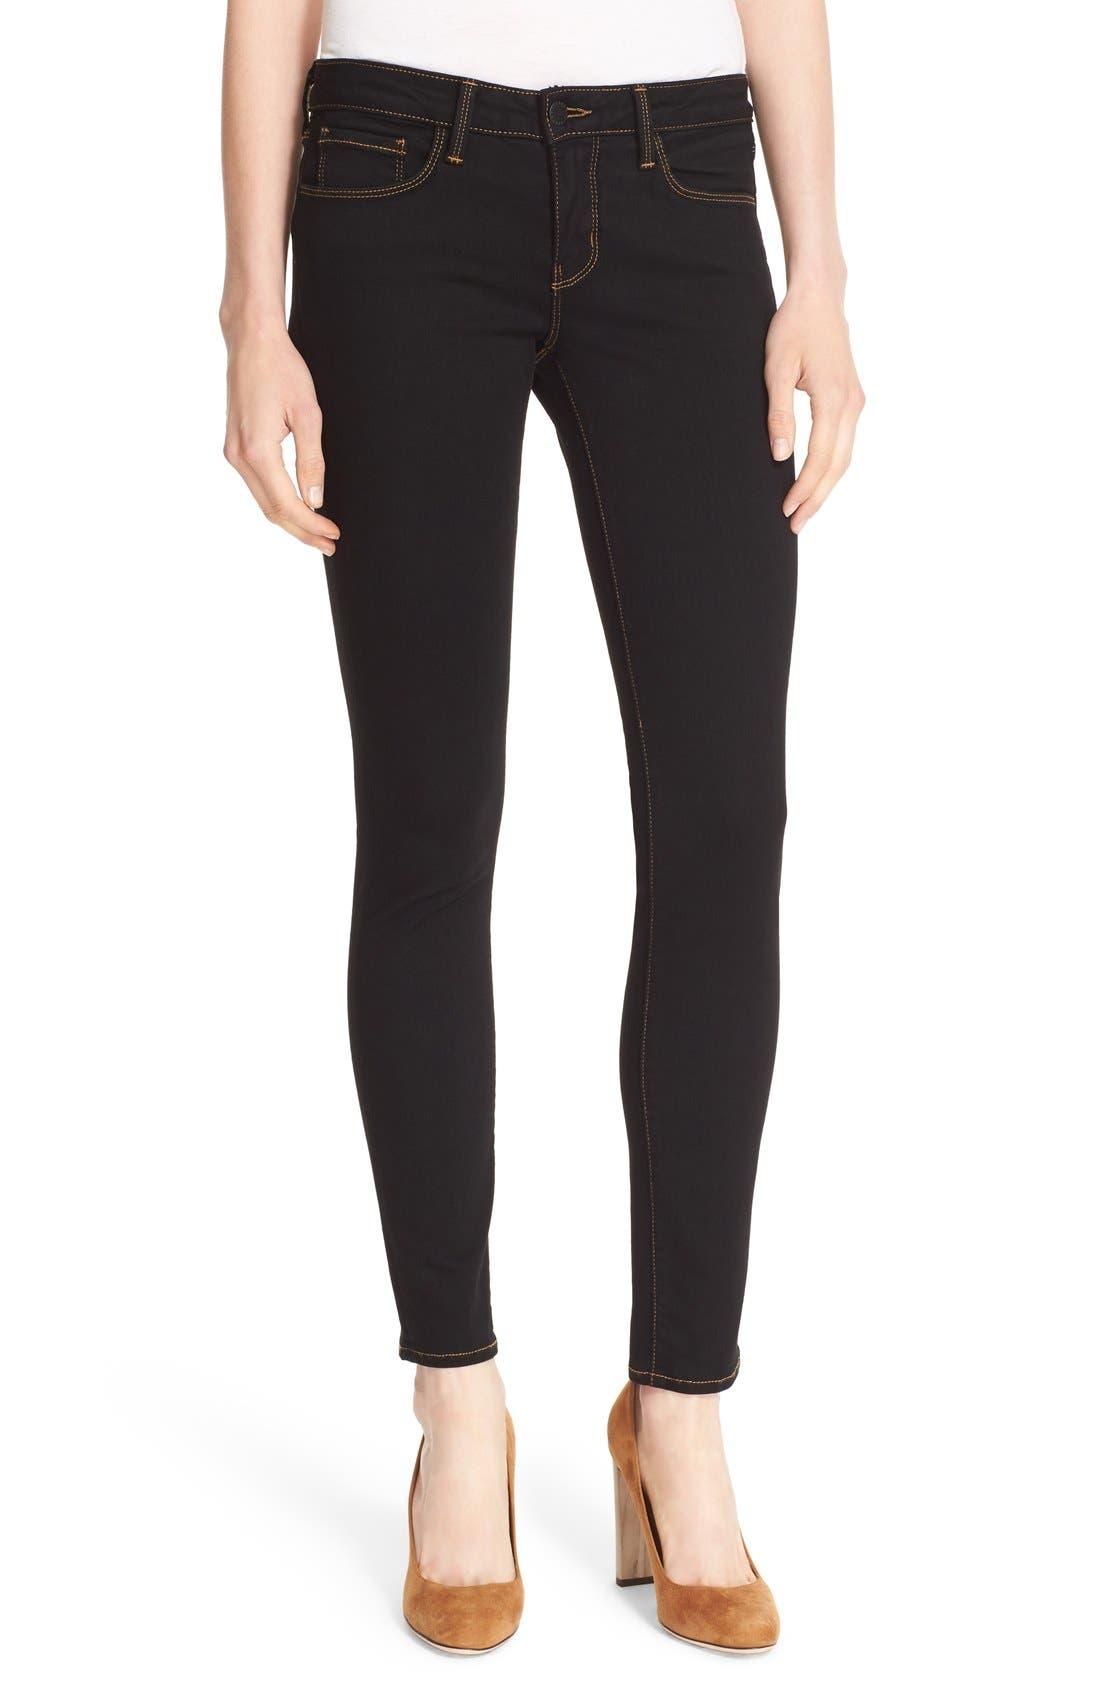 L'AGENCE,                             'Chantal' Skinny Jeans,                             Alternate thumbnail 2, color,                             001